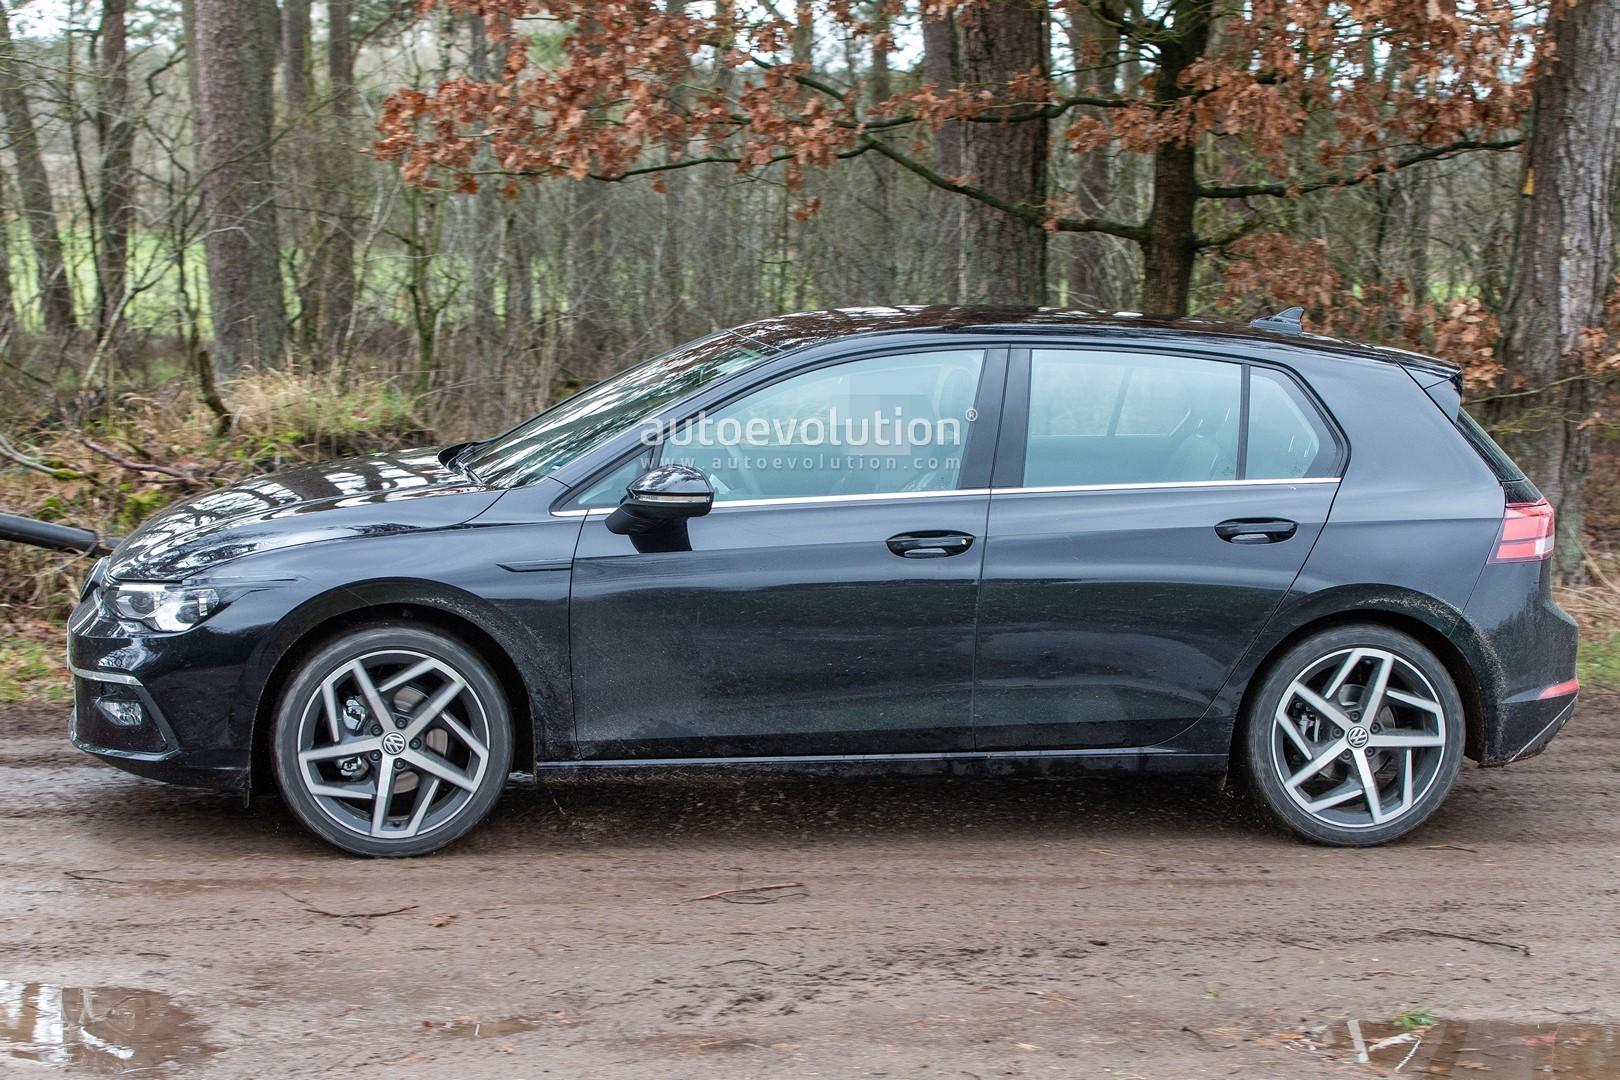 Golf Pictures: 2020 Volkswagen Golf 8 Spied Virtually Undisguised